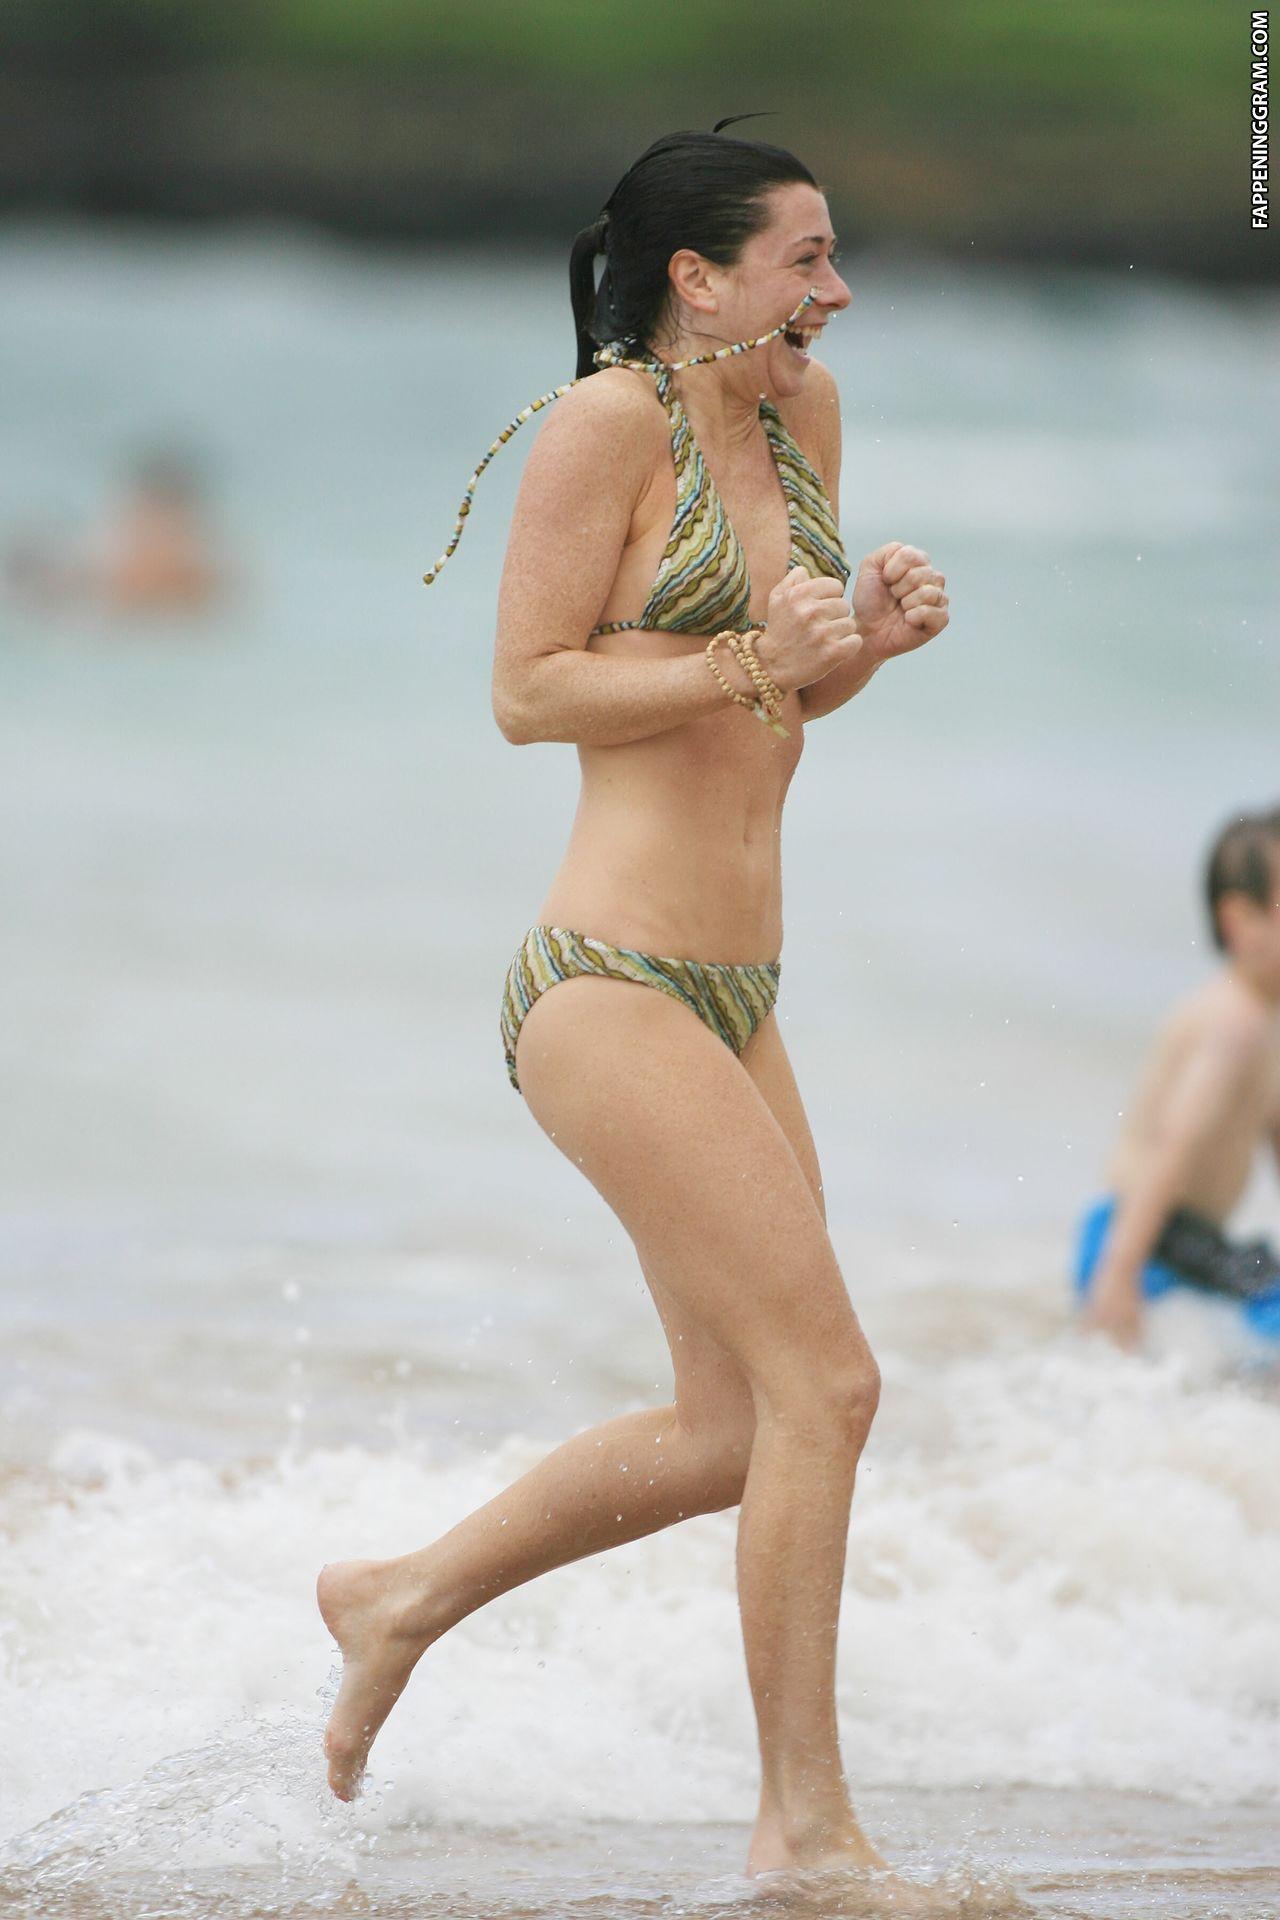 Alyson Hannigan Naked alyson hannigan nude the fappening - fappeninggram